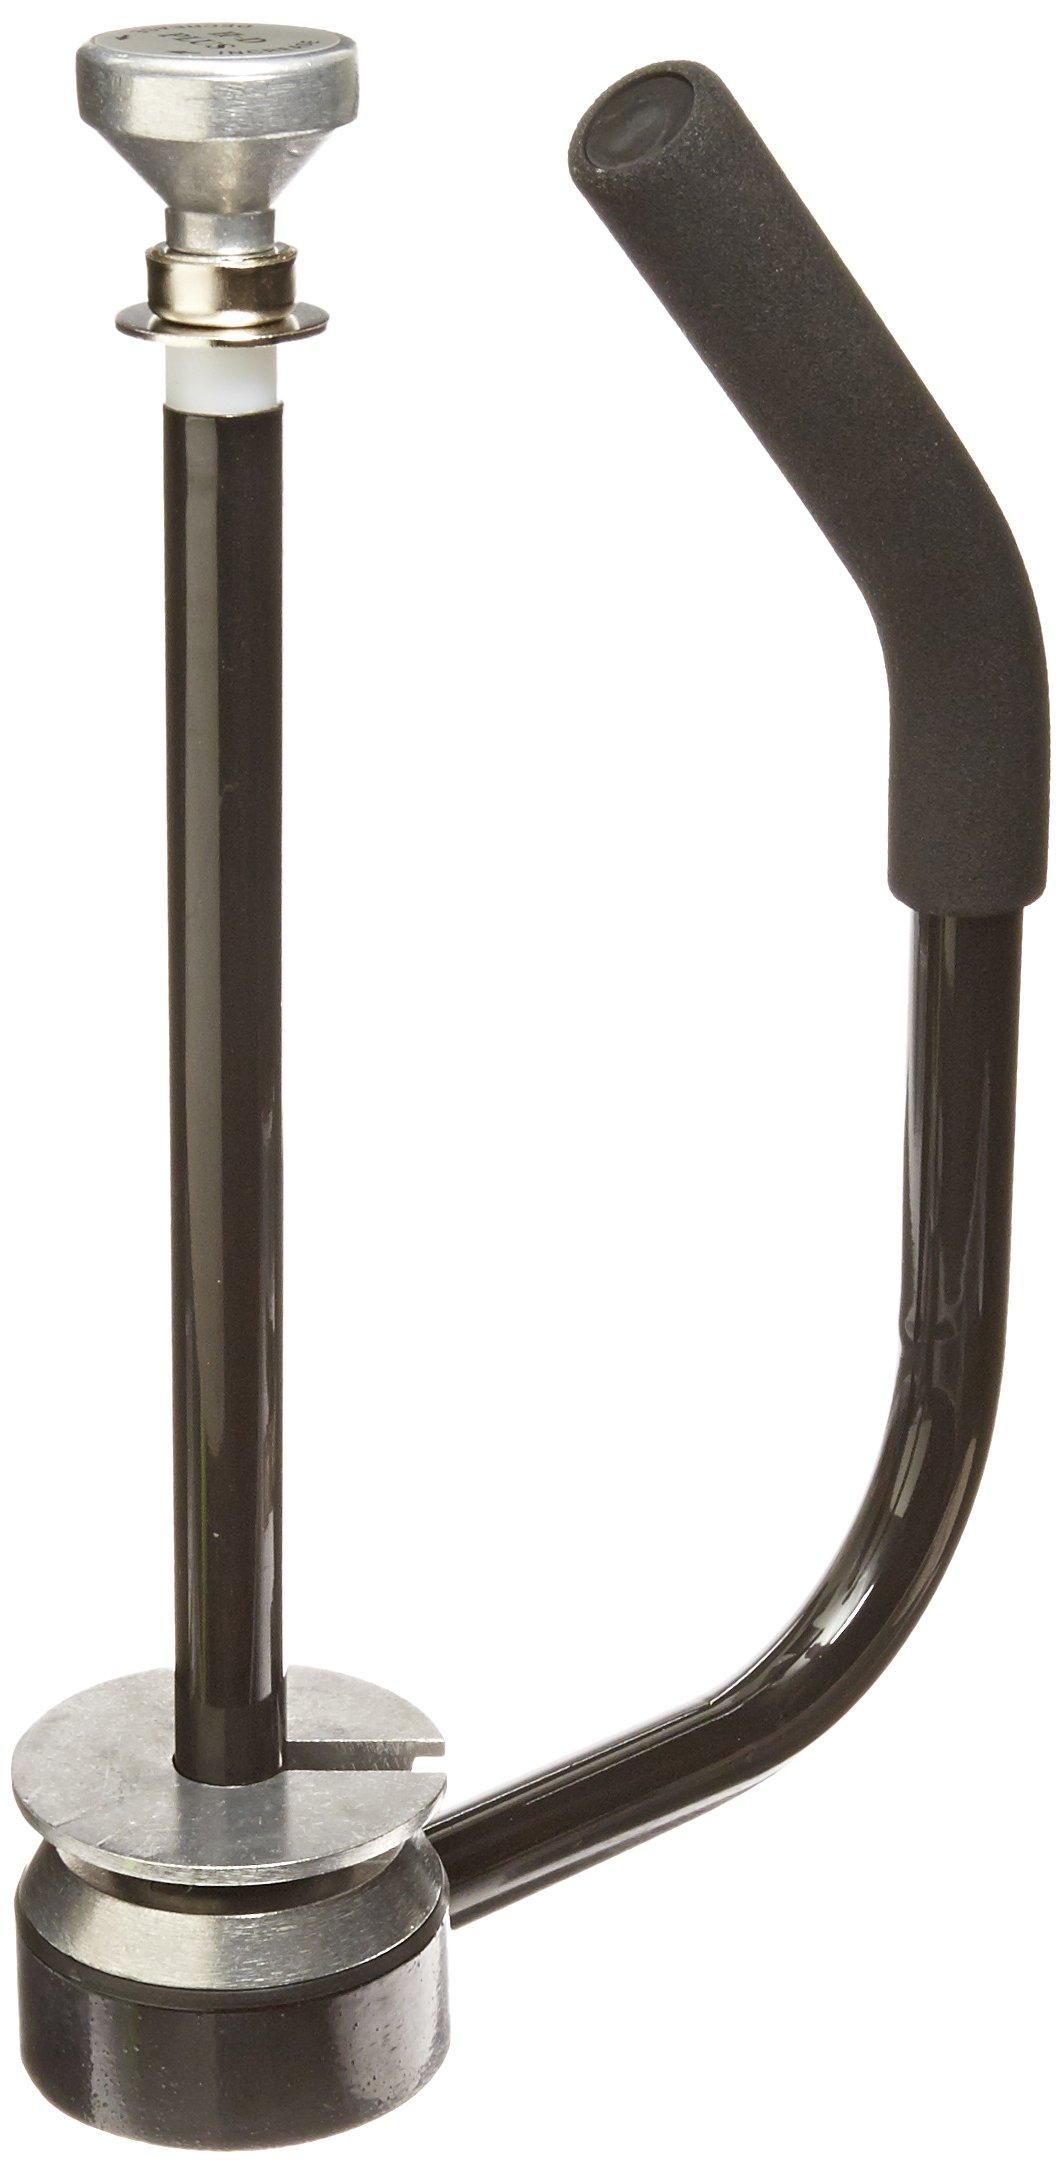 Aviditi Heavy-Duty Stretch Film Dispenser with Knob Grip, 20'', Black (SFDIS277) by Aviditi